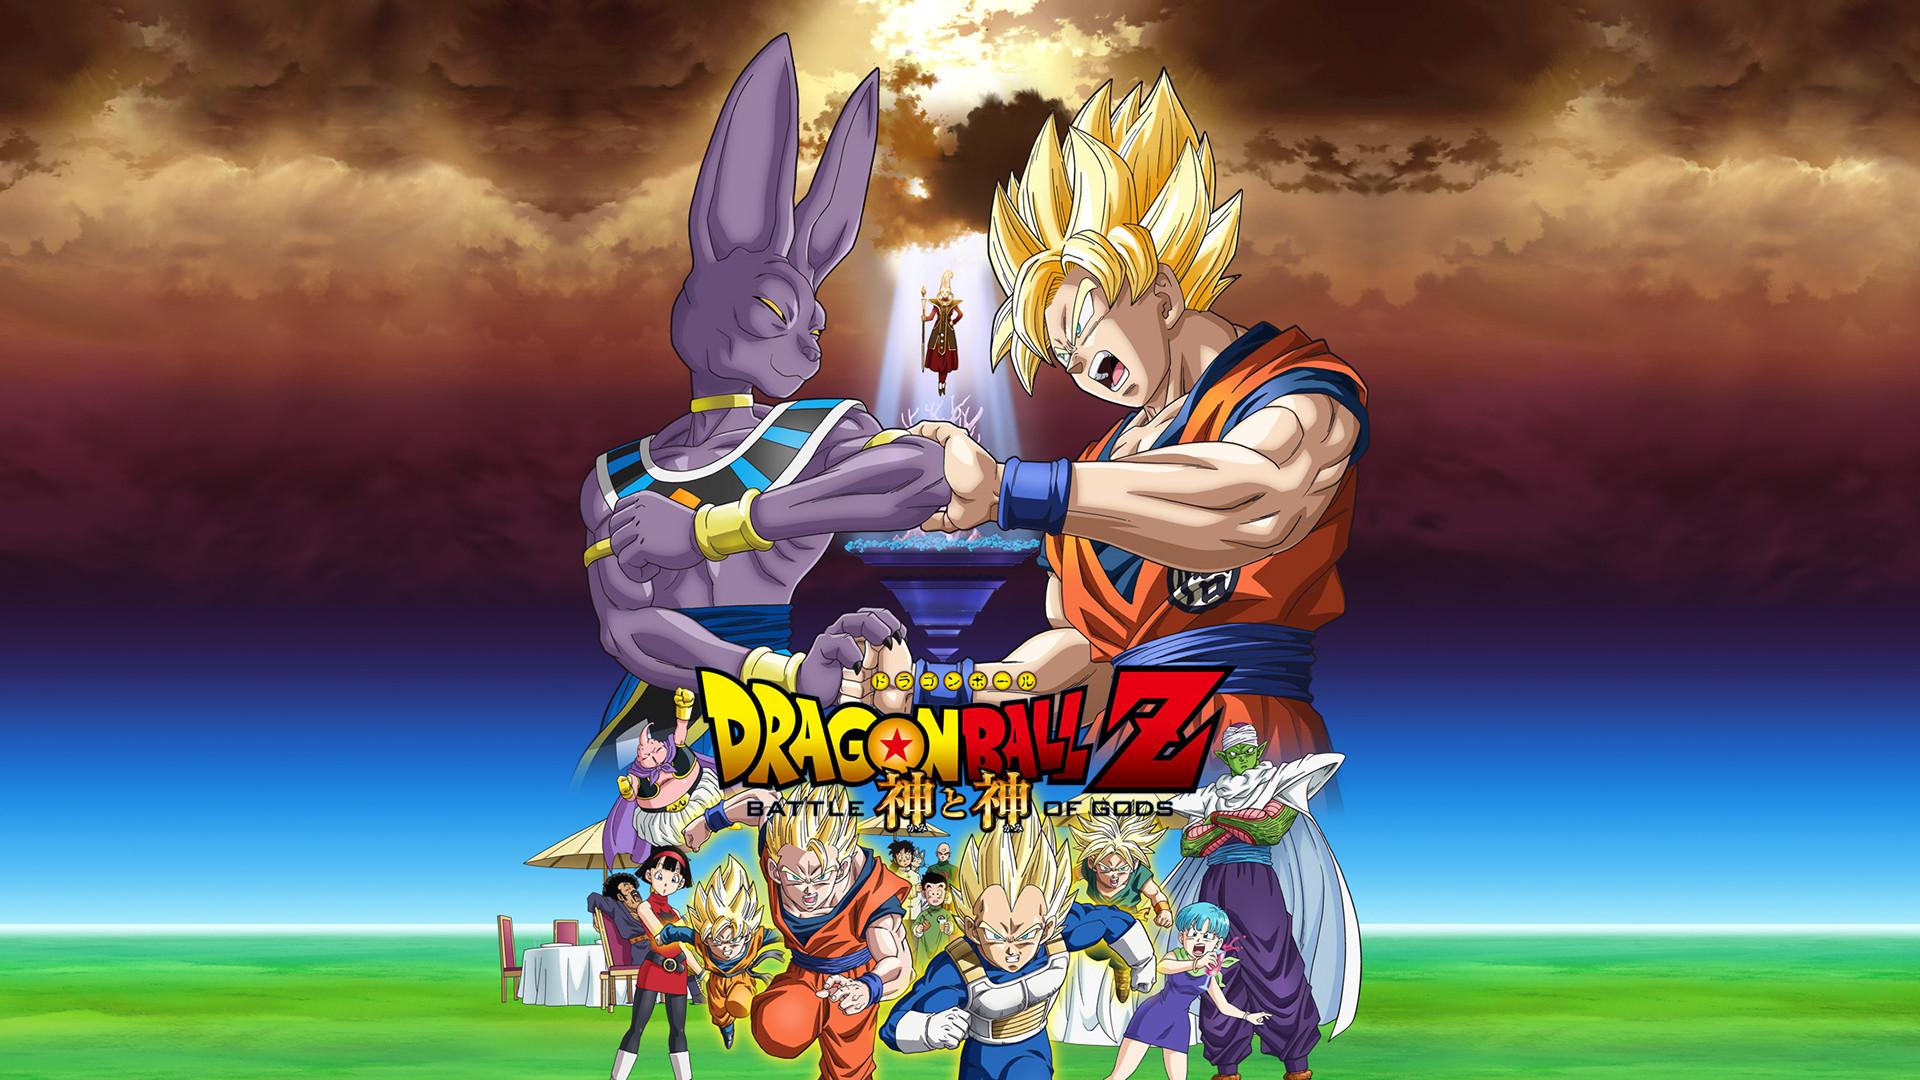 Dragon Ball Z Hd Wallpaper Background Image 1920x1080 Id